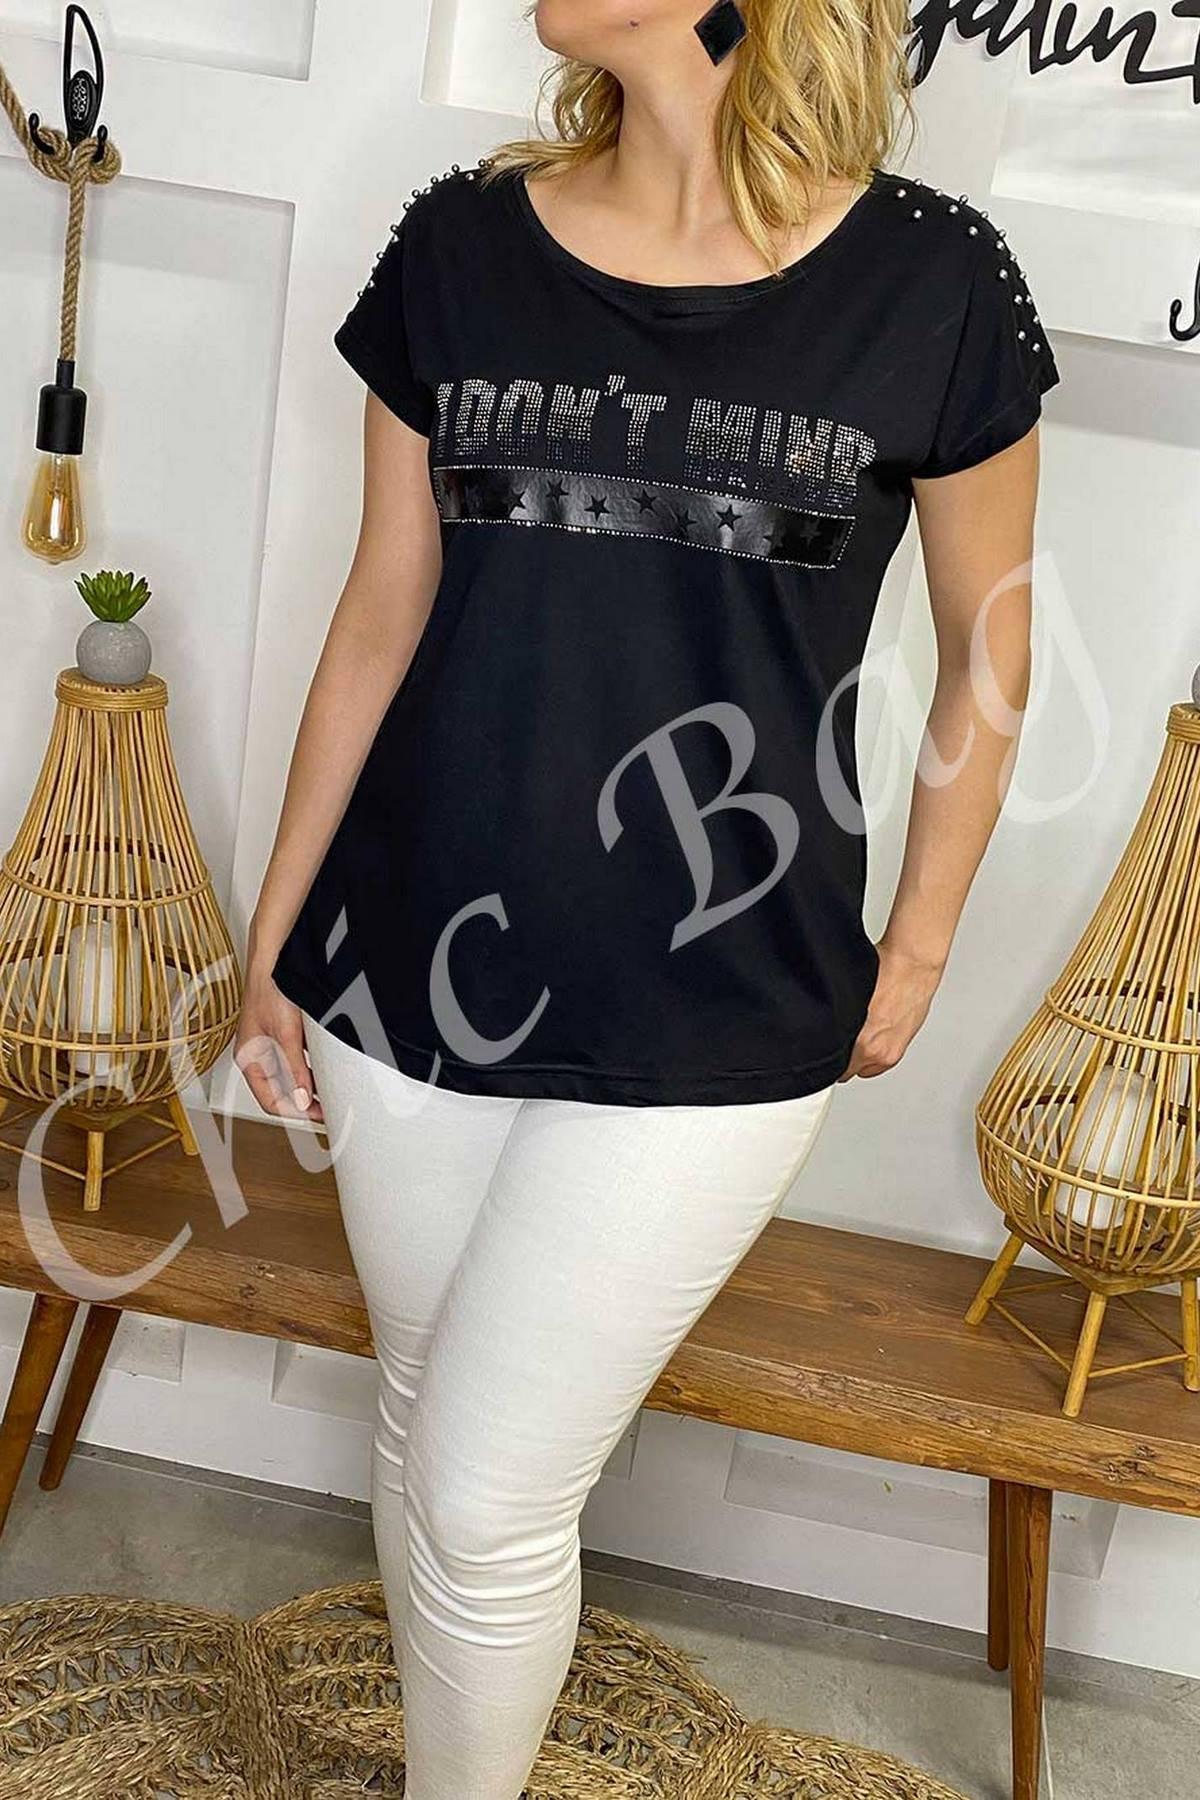 https://resim.chicbag.com.tr/p000955/shy/i-dont-mind-baski-t-shirt-swns-01df4f8b51aa.